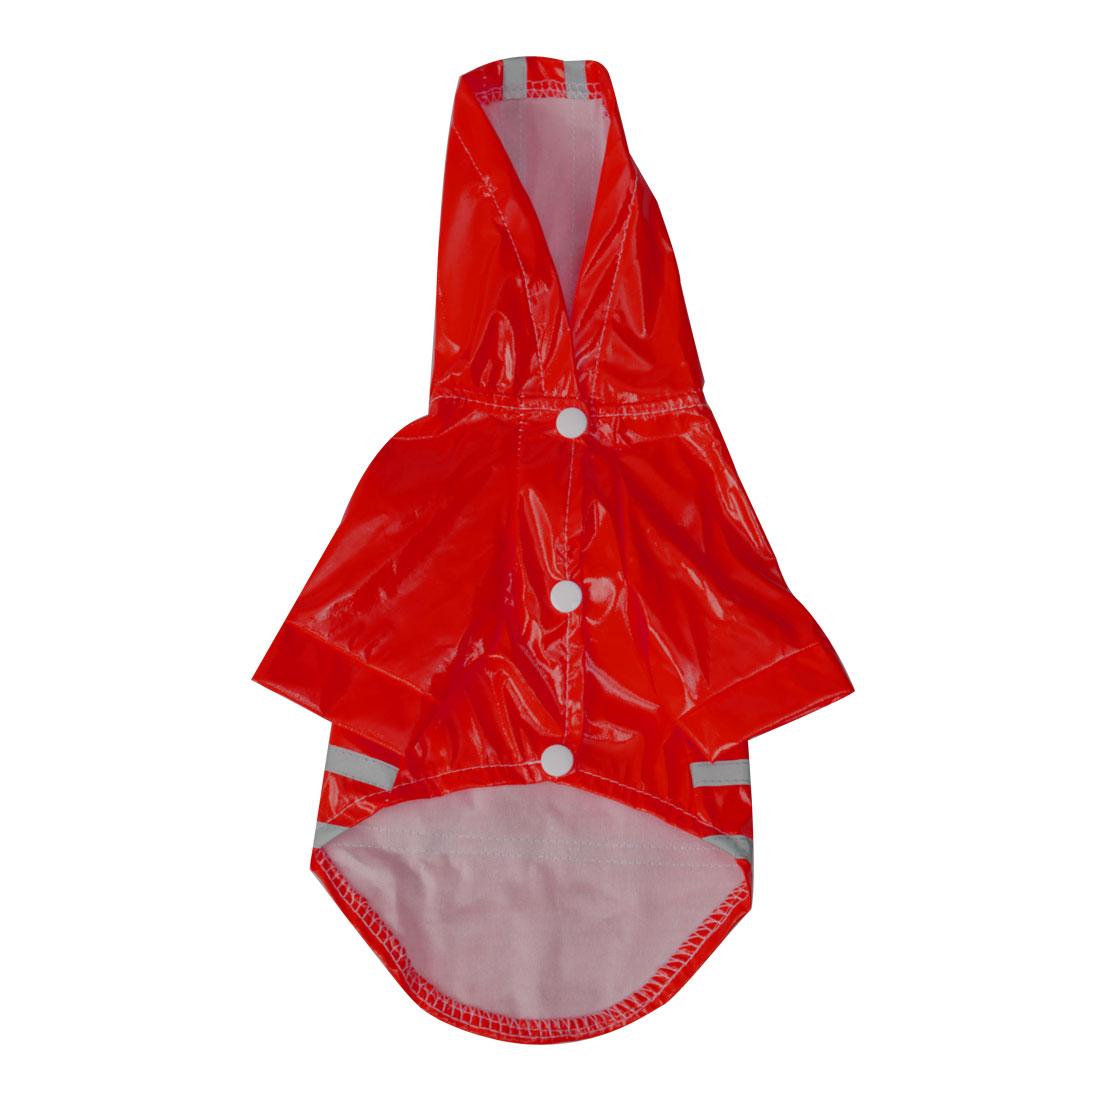 Pet Dog Raincoat Jacket Poncho Coat Polyester Water-resistant Rainwear, Red XL